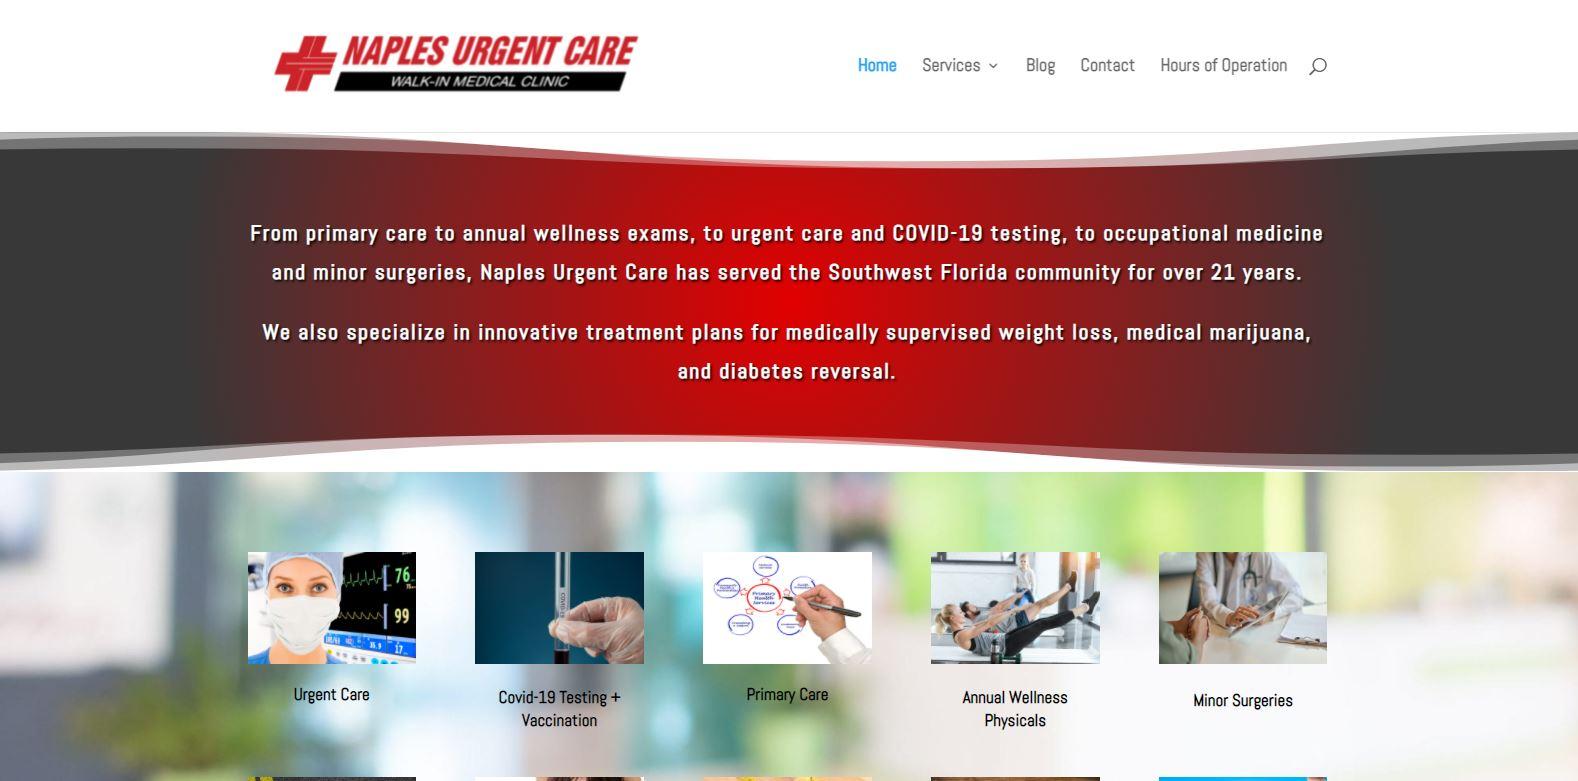 Naples-Urgent-Care-Home-Page